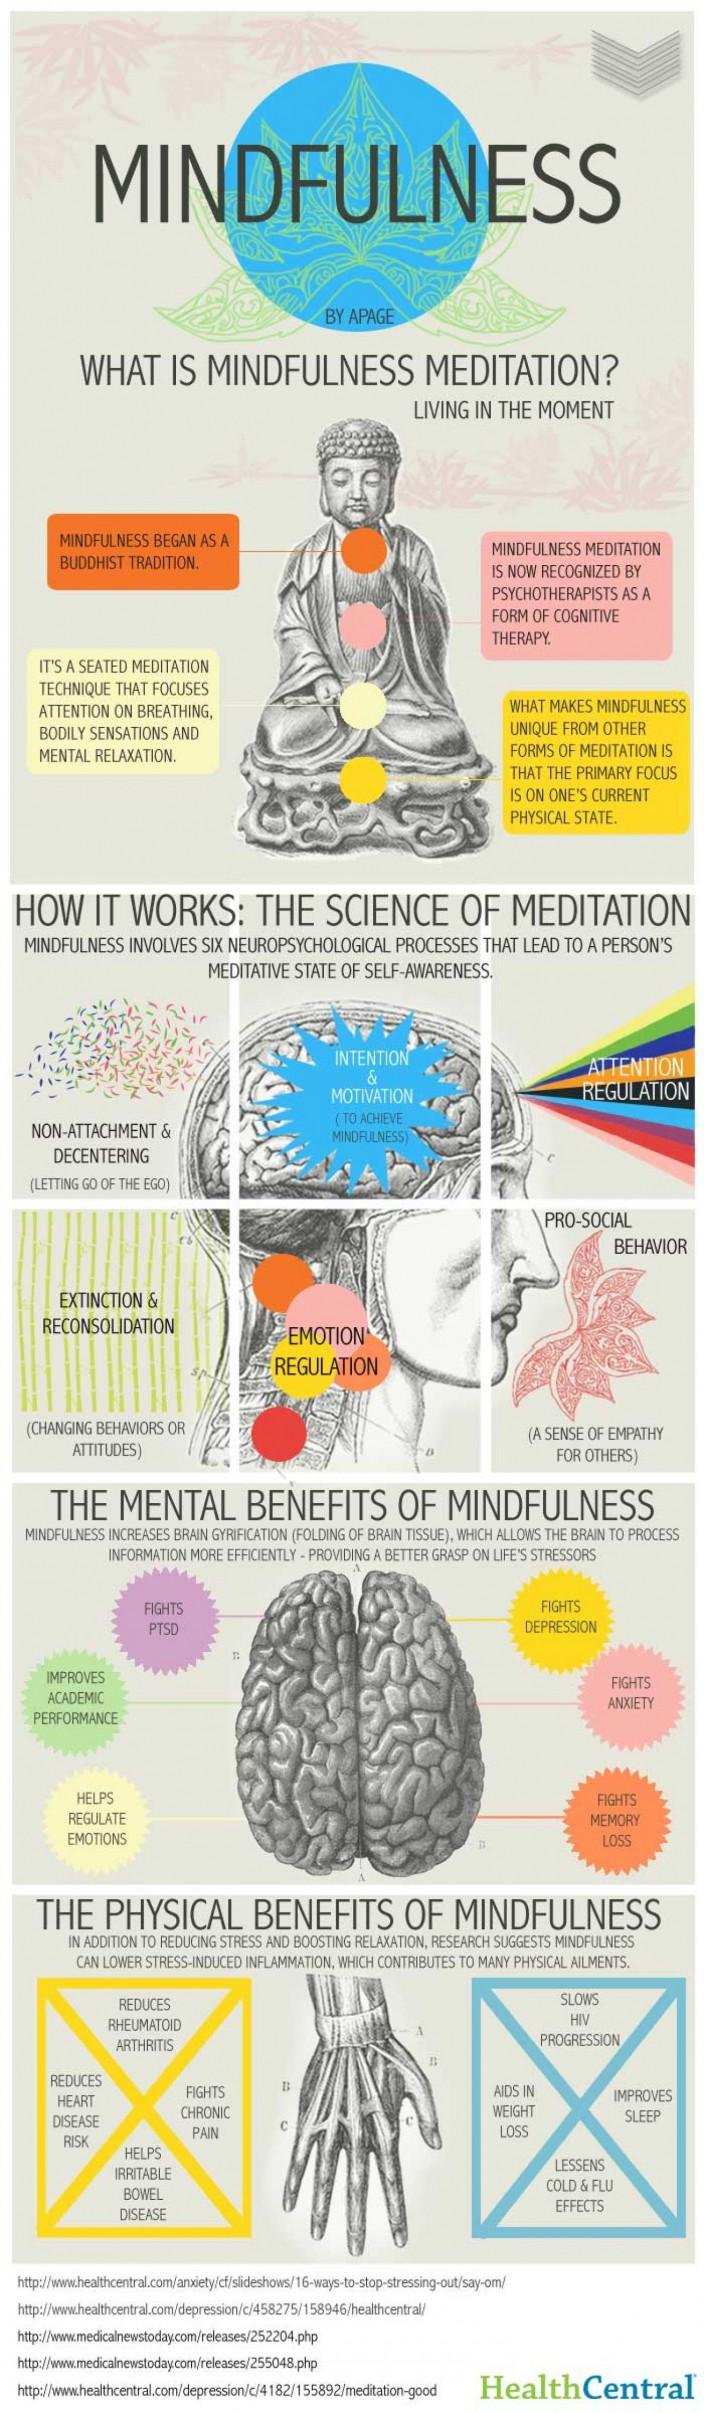 mindfulness_519252dac41cf_w15001-704x2413